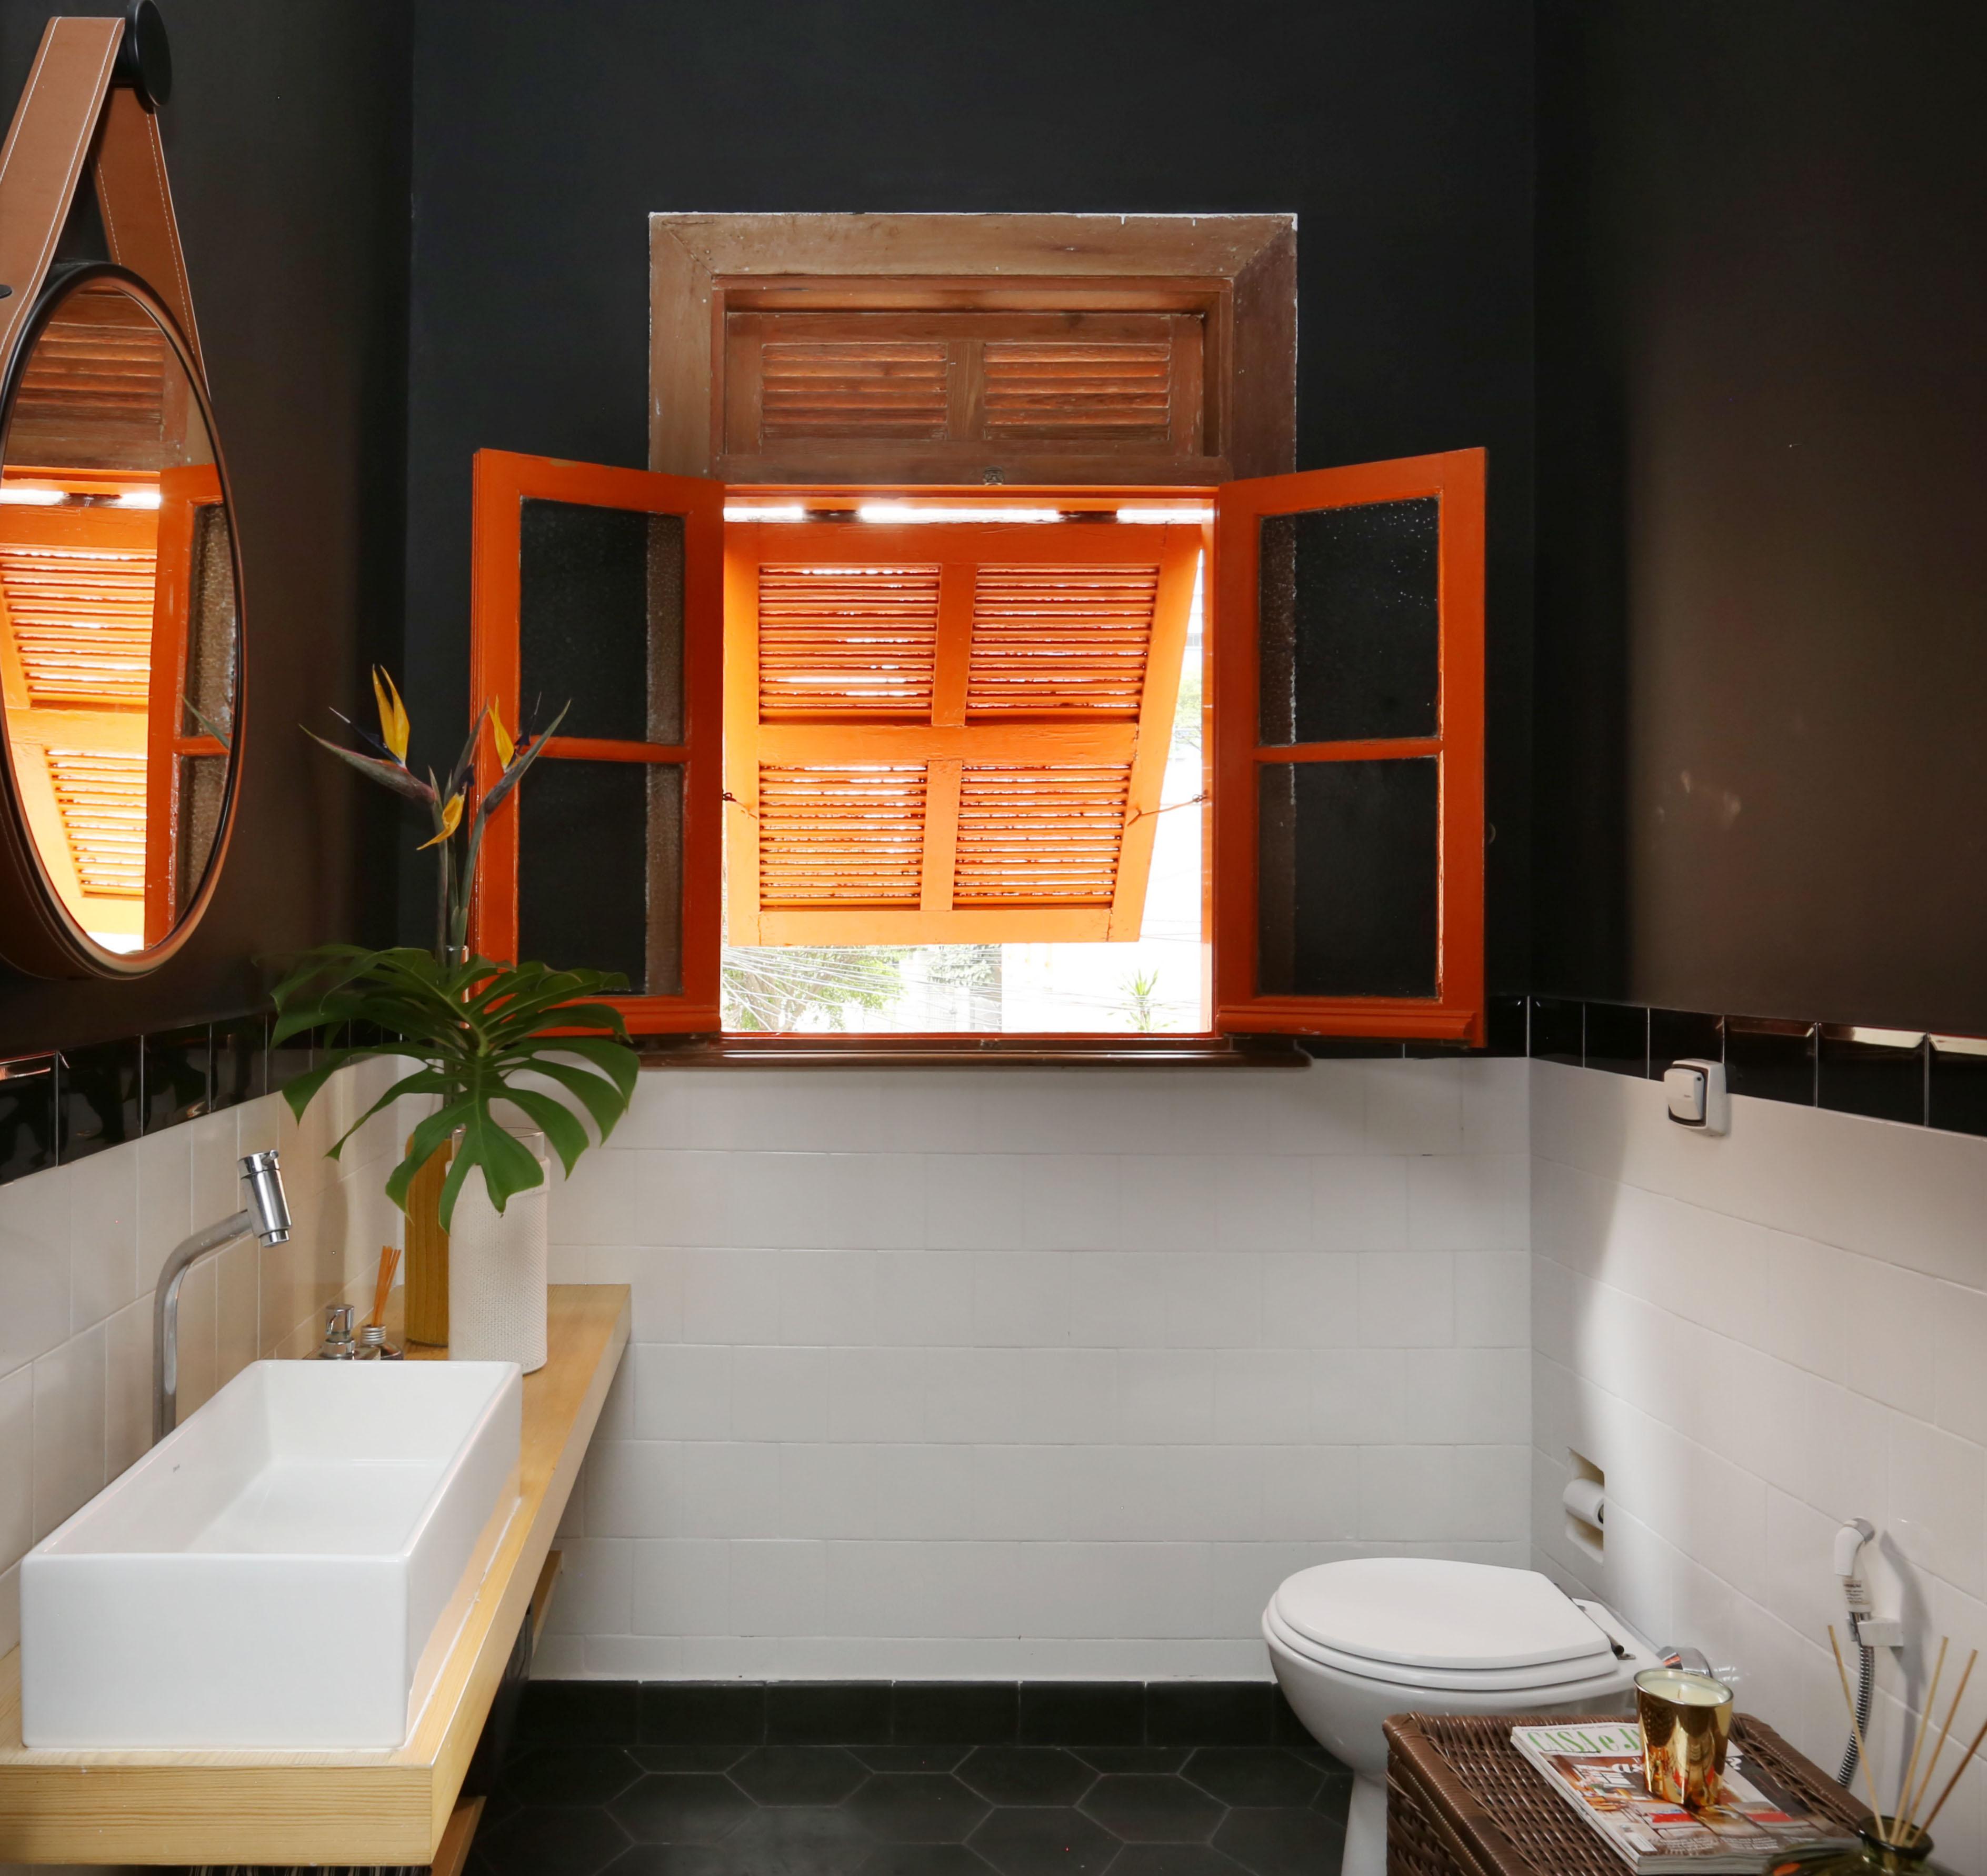 03_lavabo IMG_7110-1